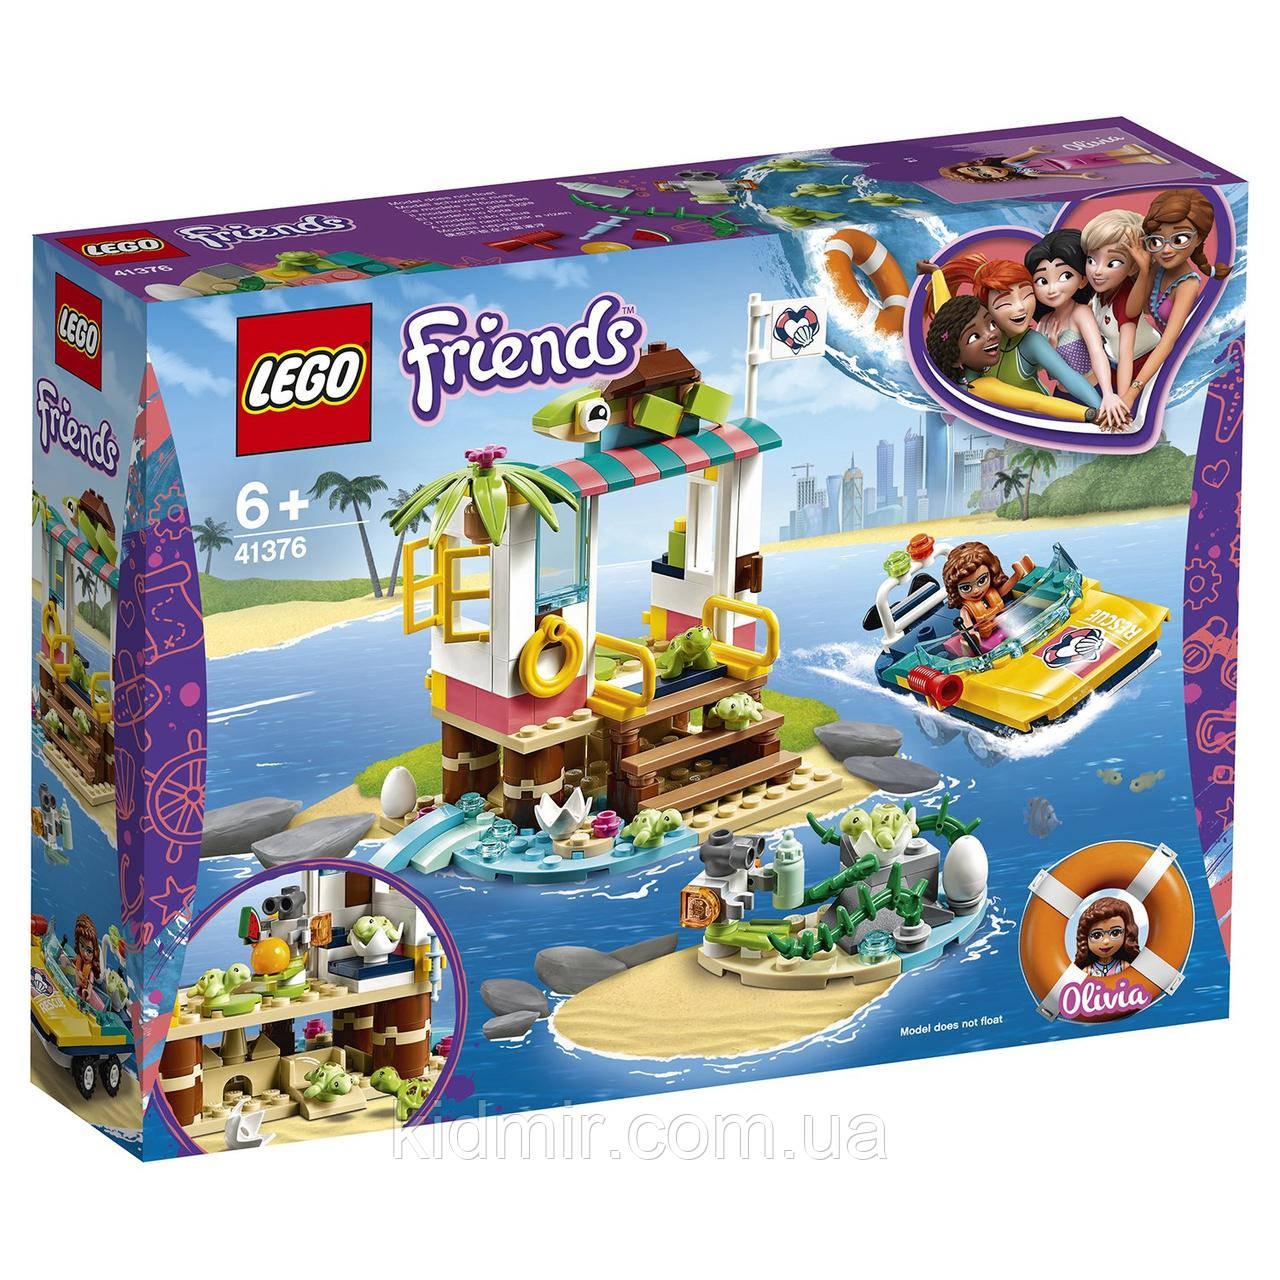 Конструктор LEGO Friends 41376 Спасение черепах